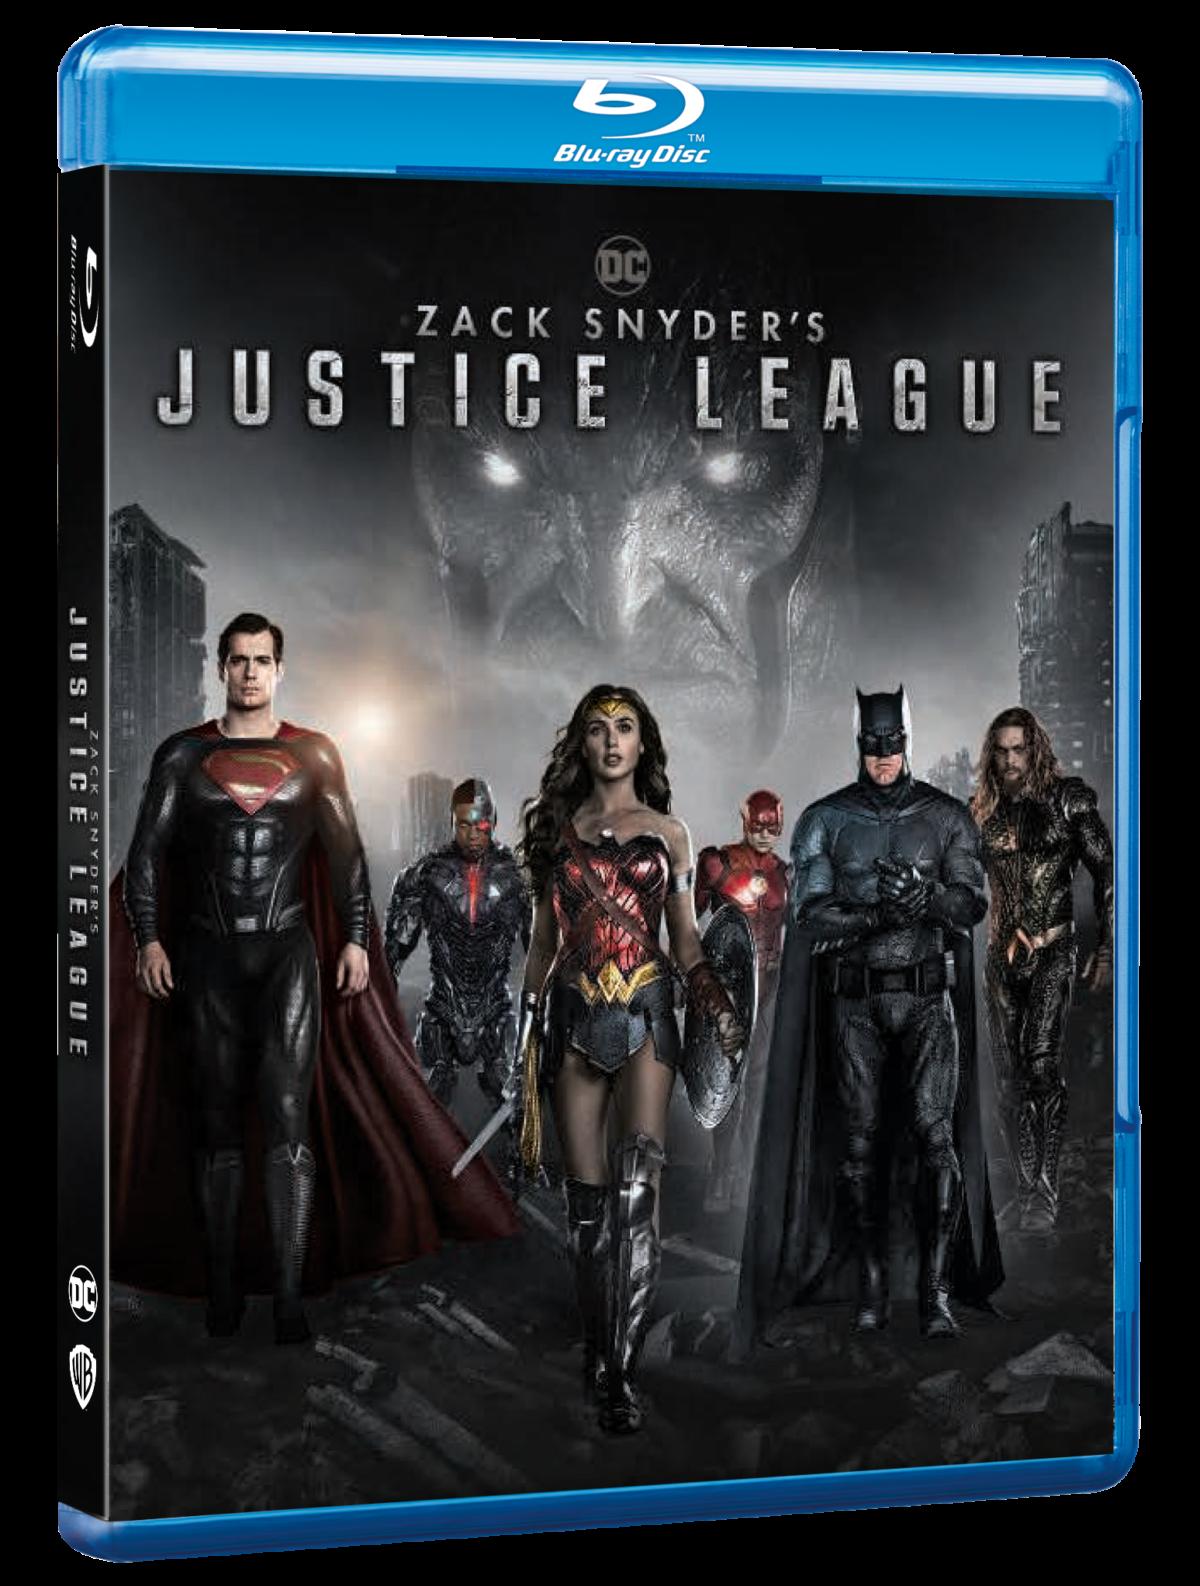 BD_Zack_Snyder_Justice_League